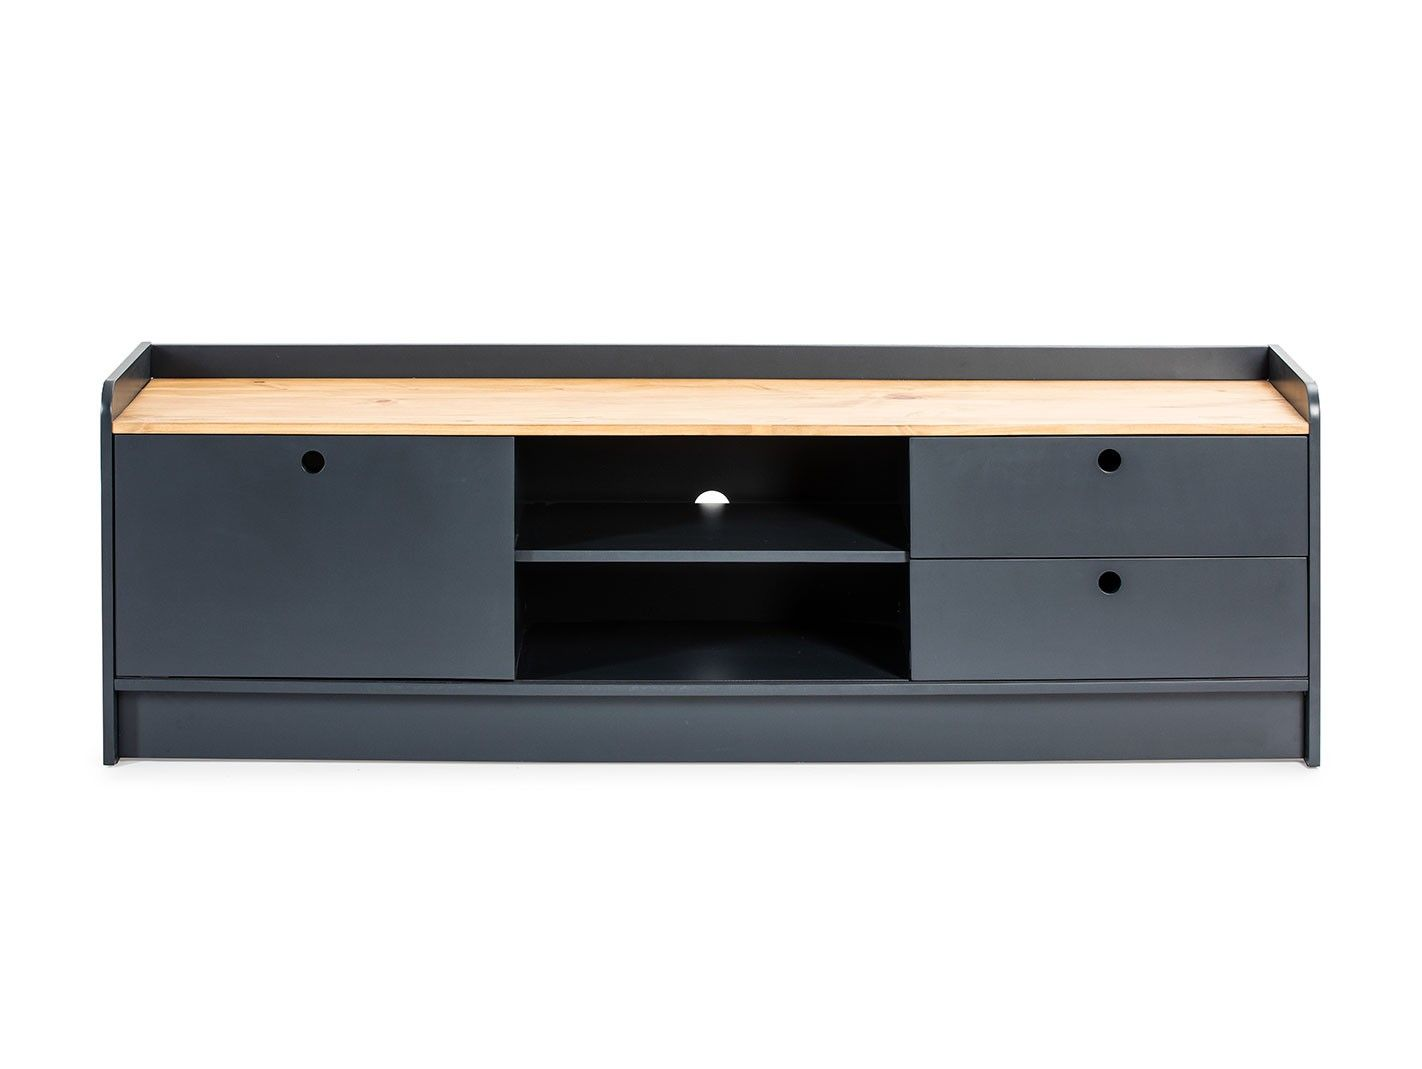 Galan de noche mueble conforama cheap design espejos de for Armario zapatero conforama